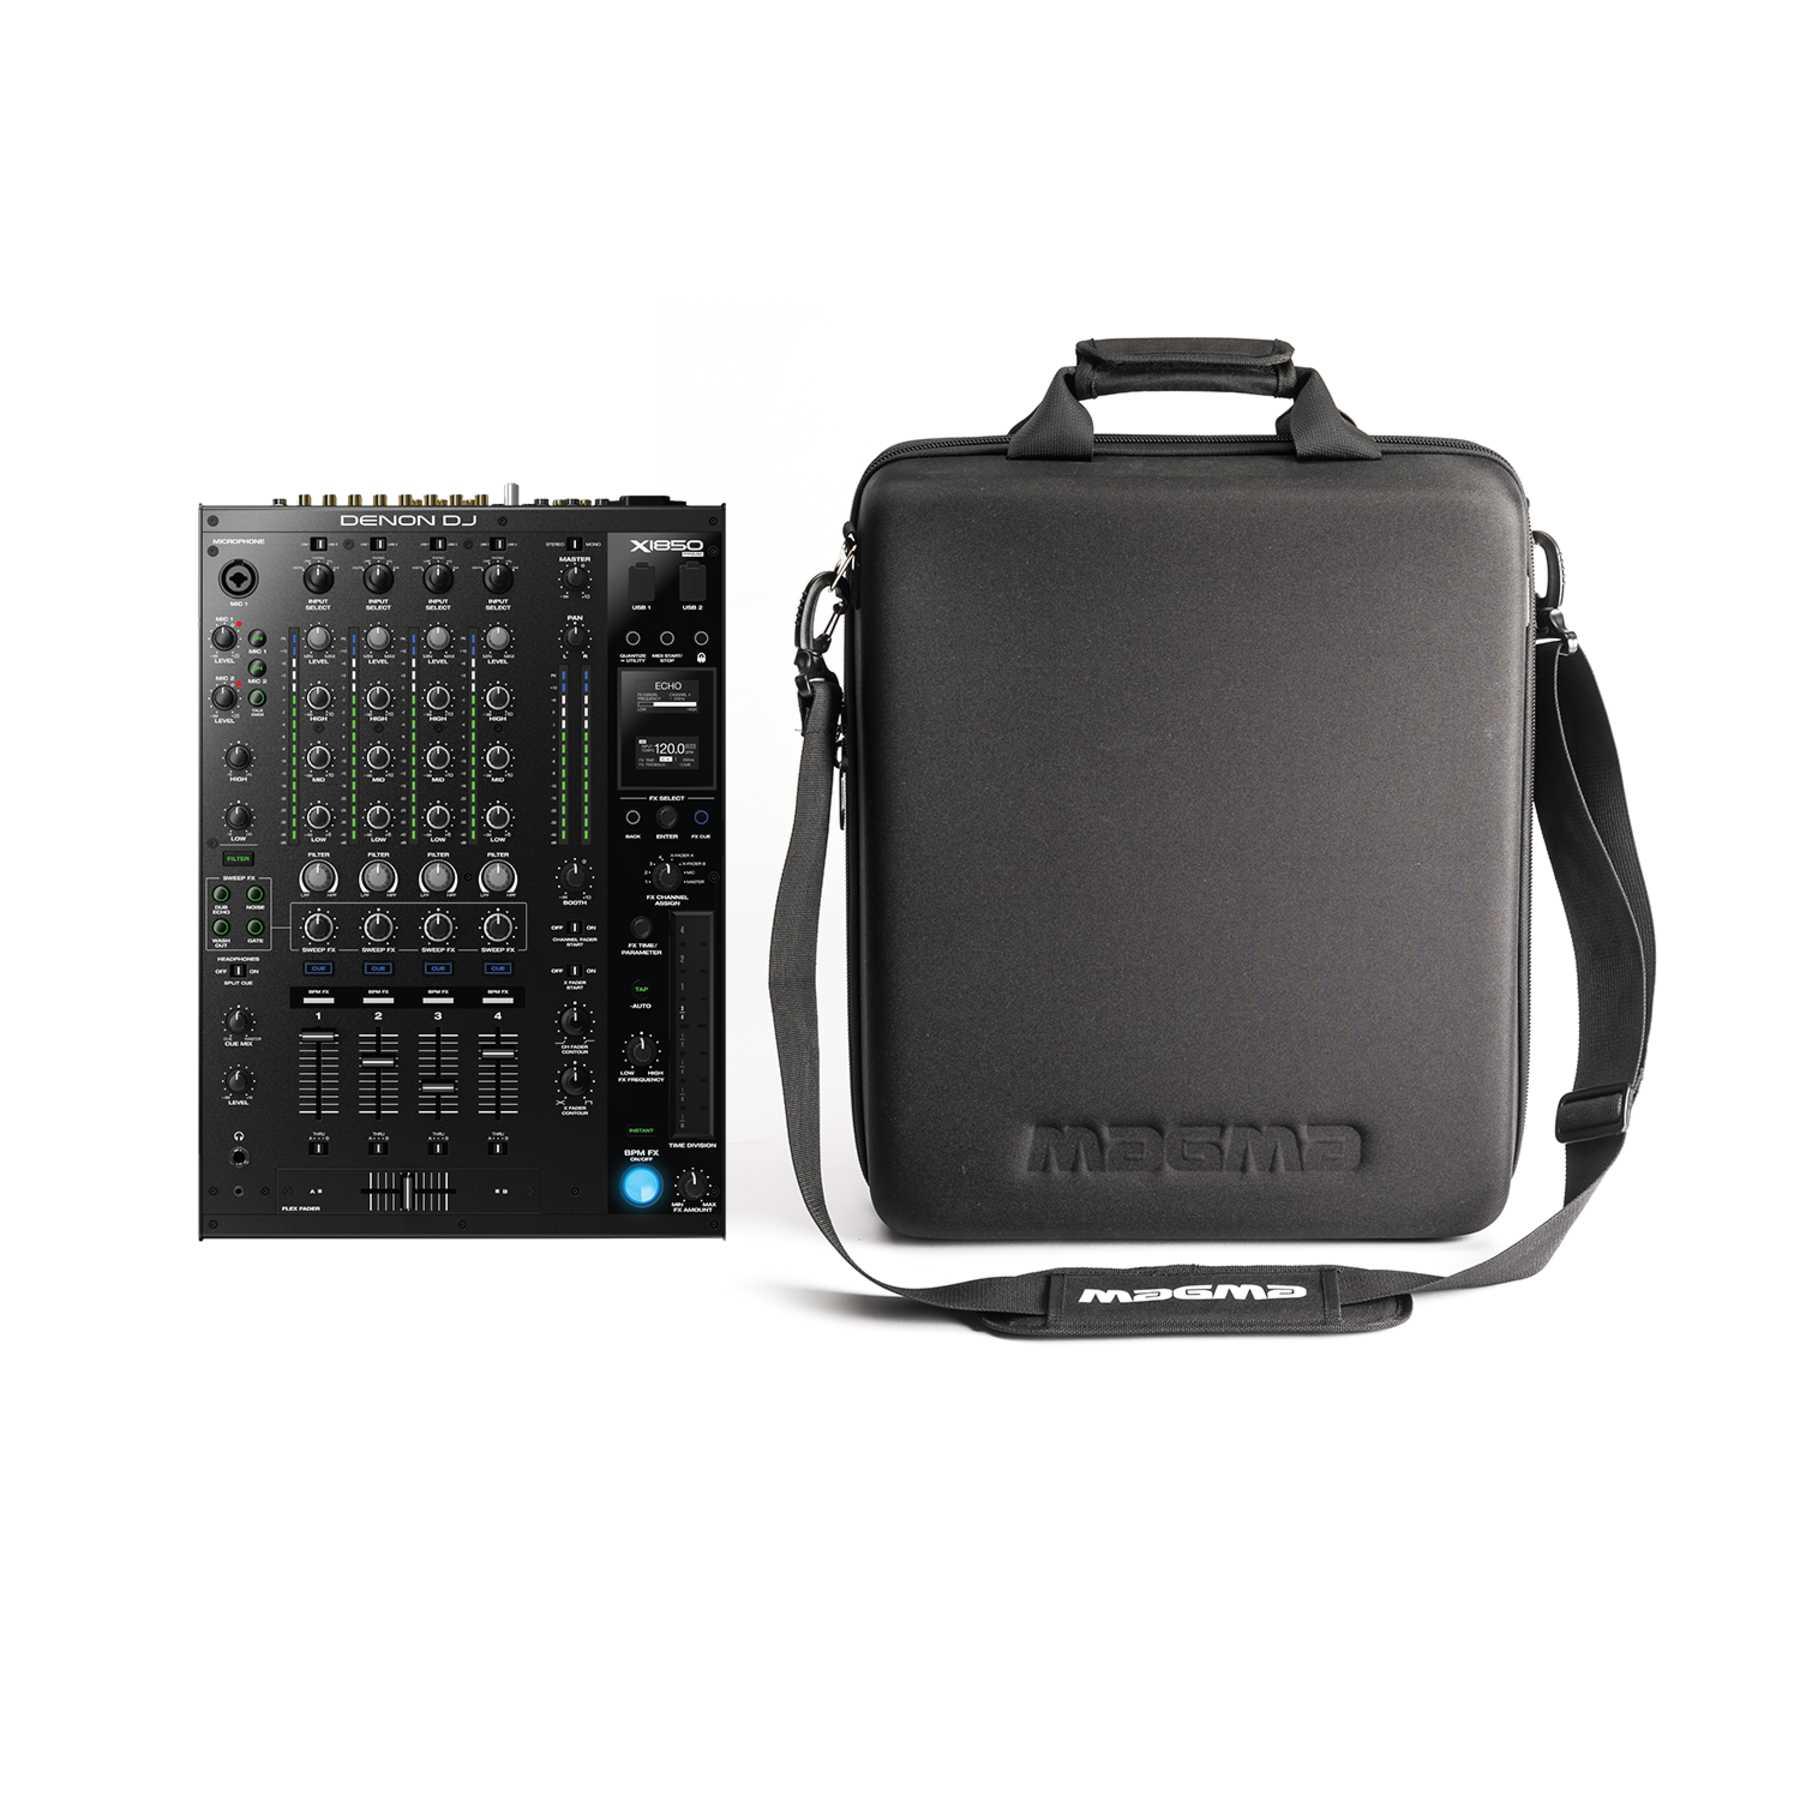 Denon DJ Prime Series Denon DJ Prime X1850 PRIME + Magma CTRL Case CDJ/Mixer II 243647